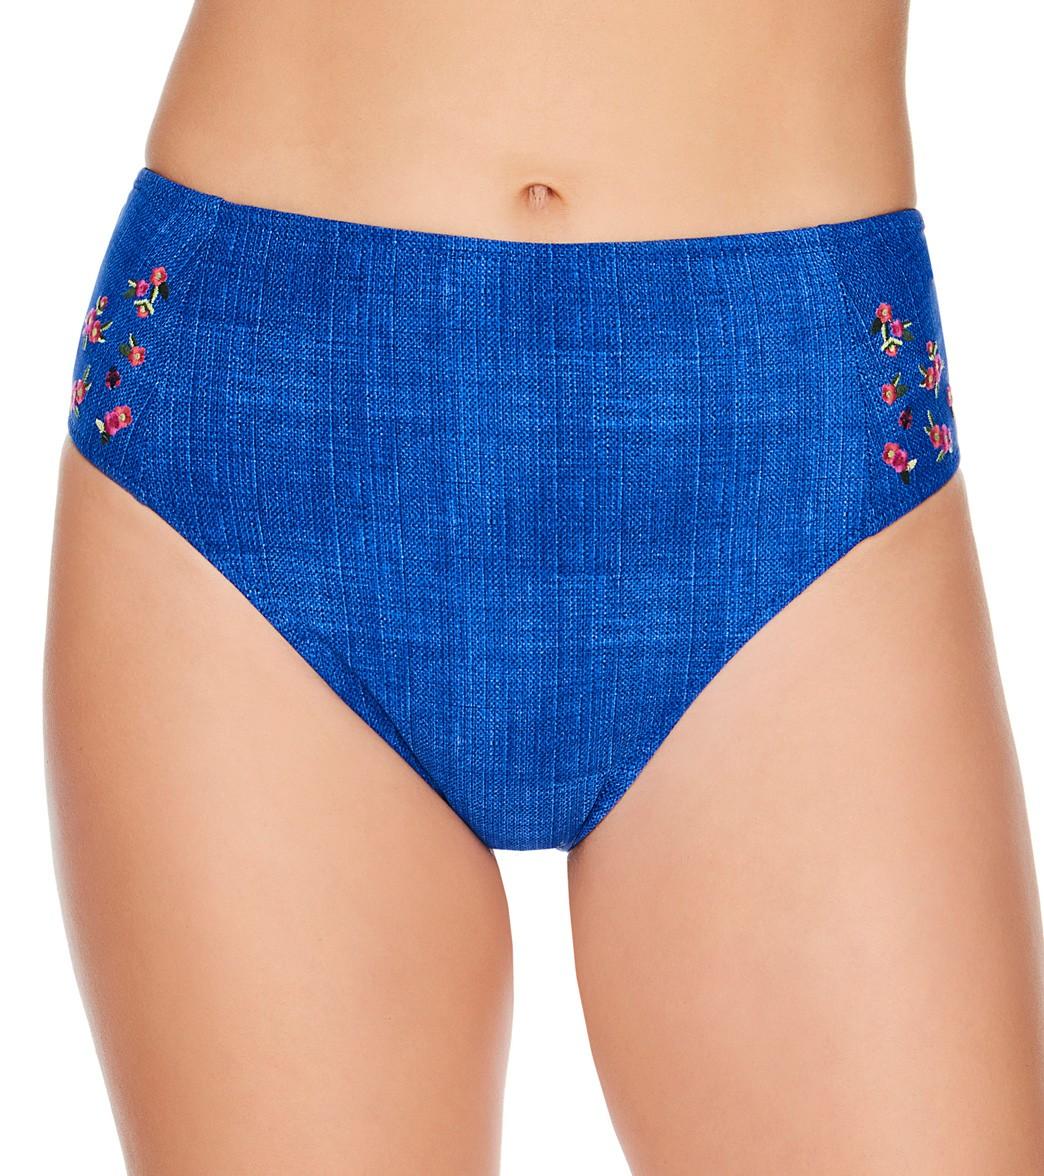 7c2c229560 Vera Bradley Reversible Chambray and Petite Paisley Lily High Waisted Bikini  Bottom